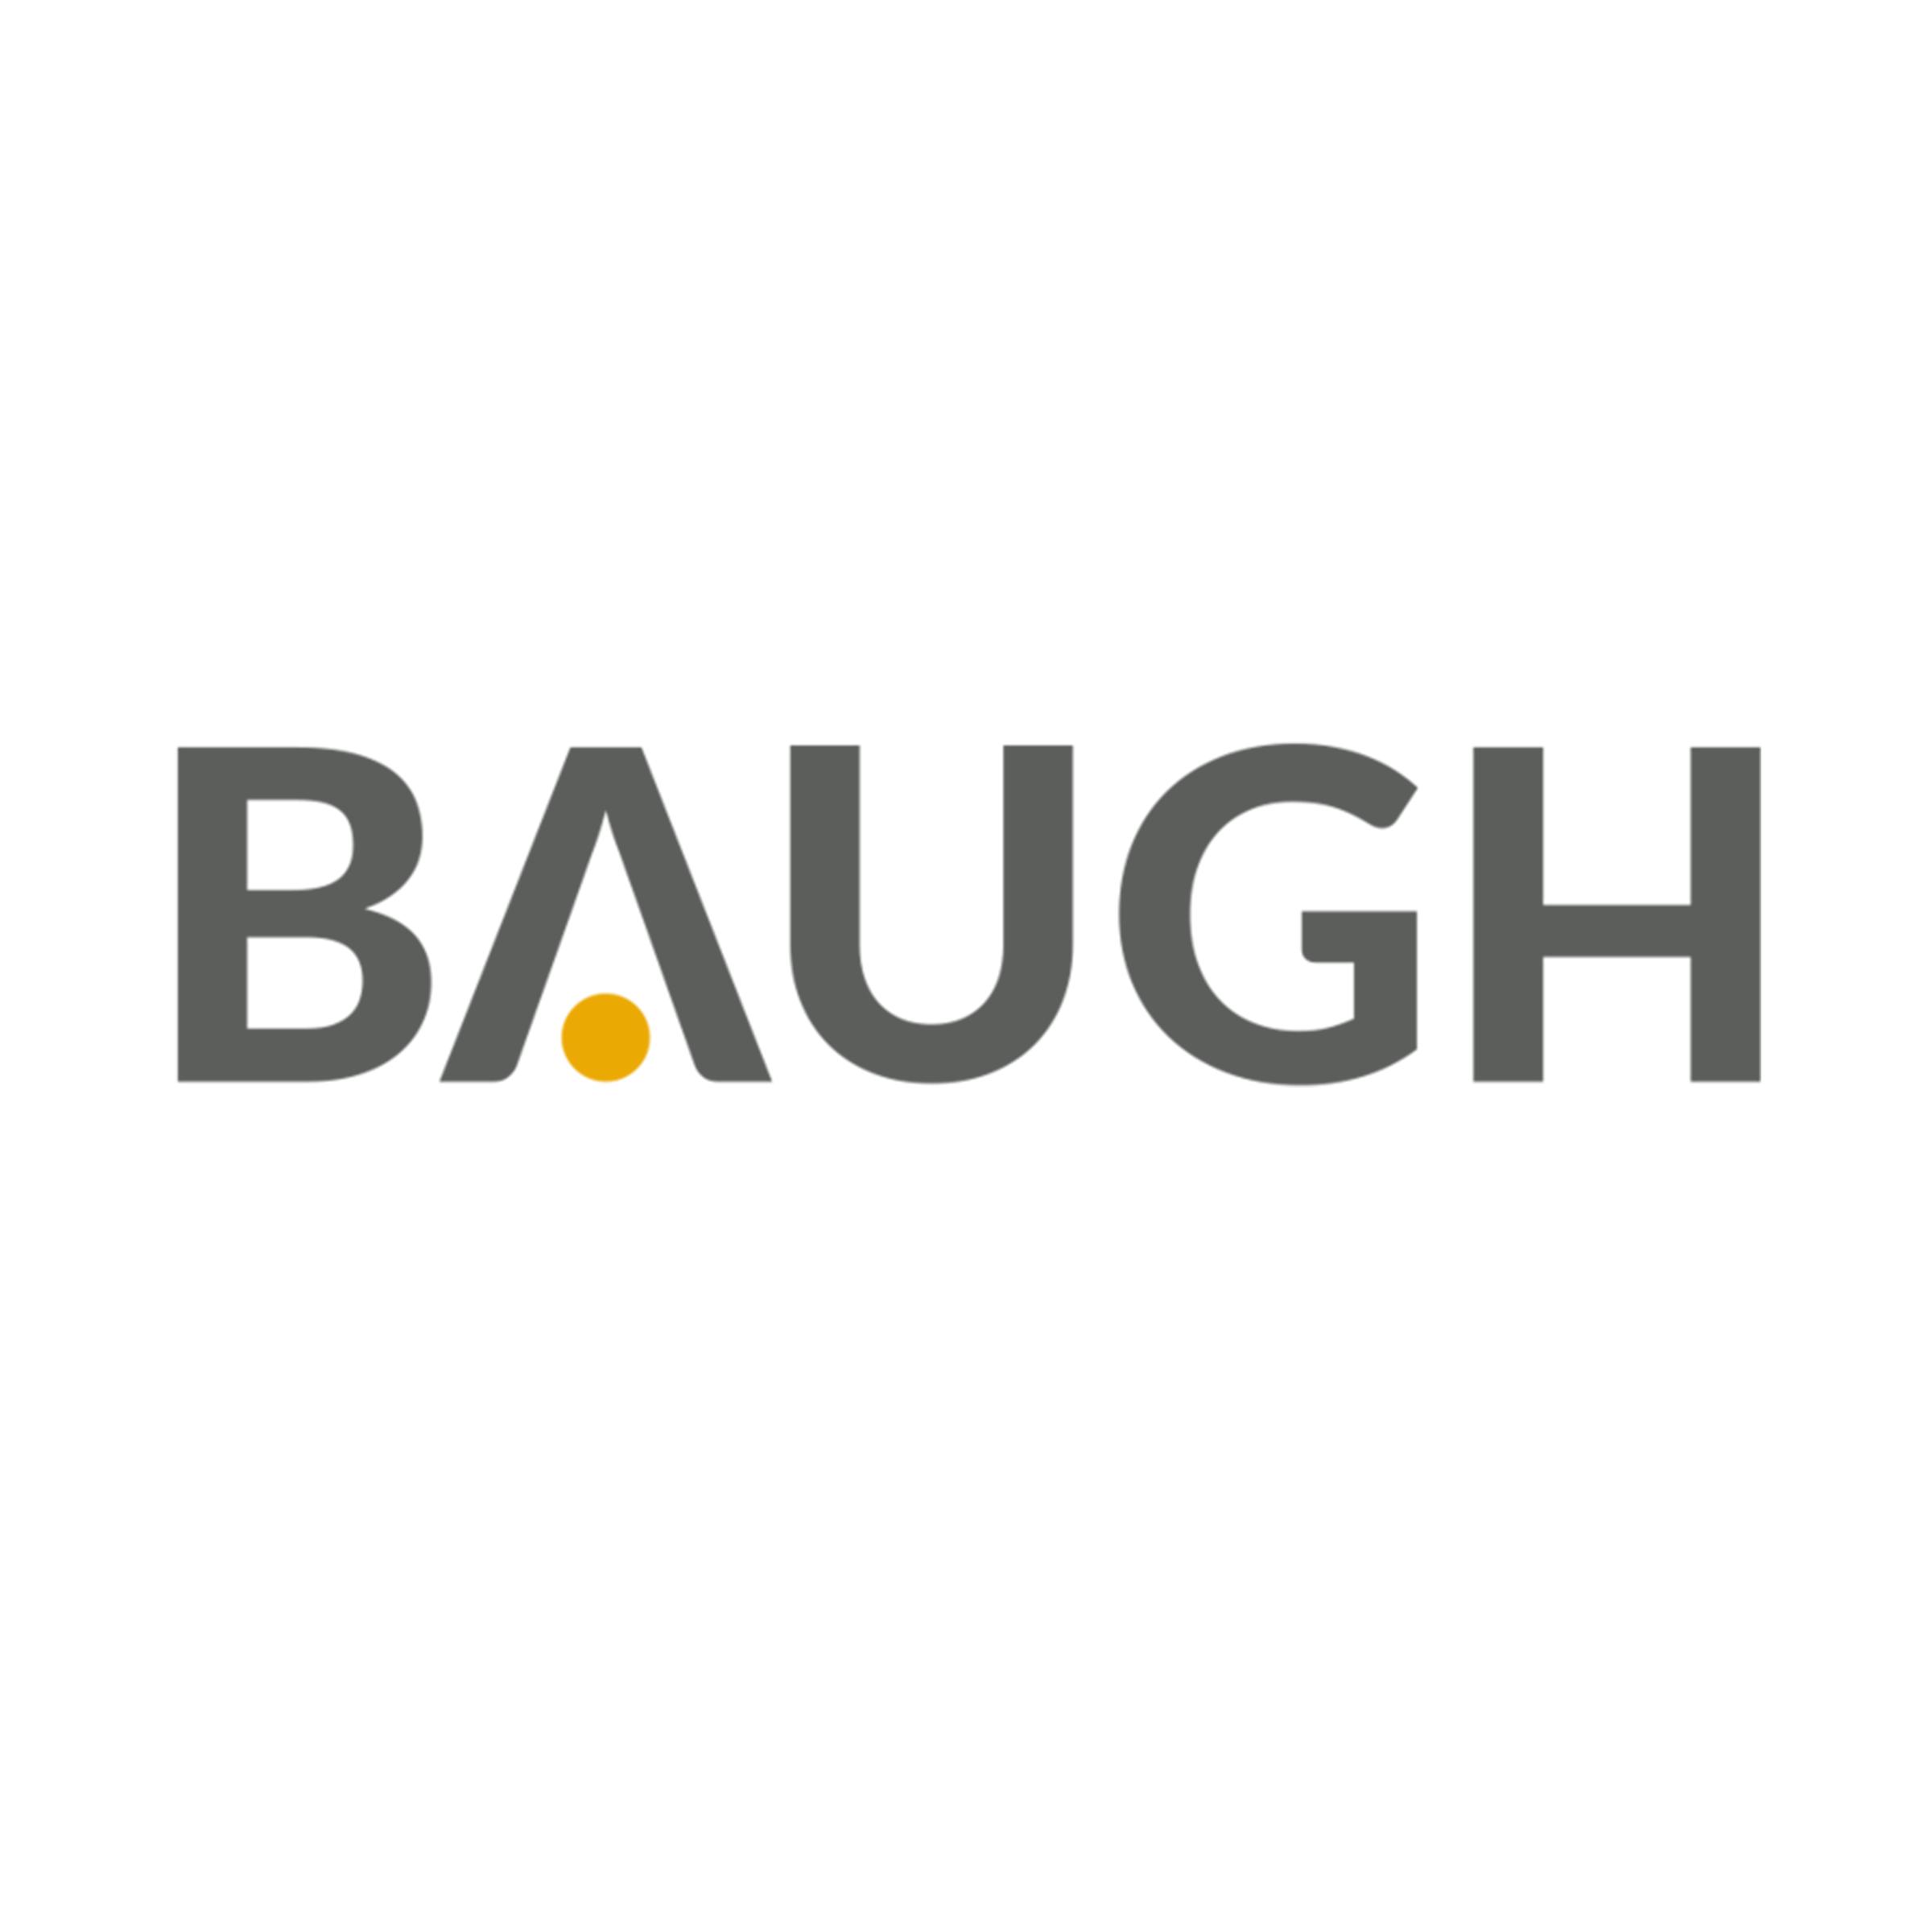 Mark Baugh